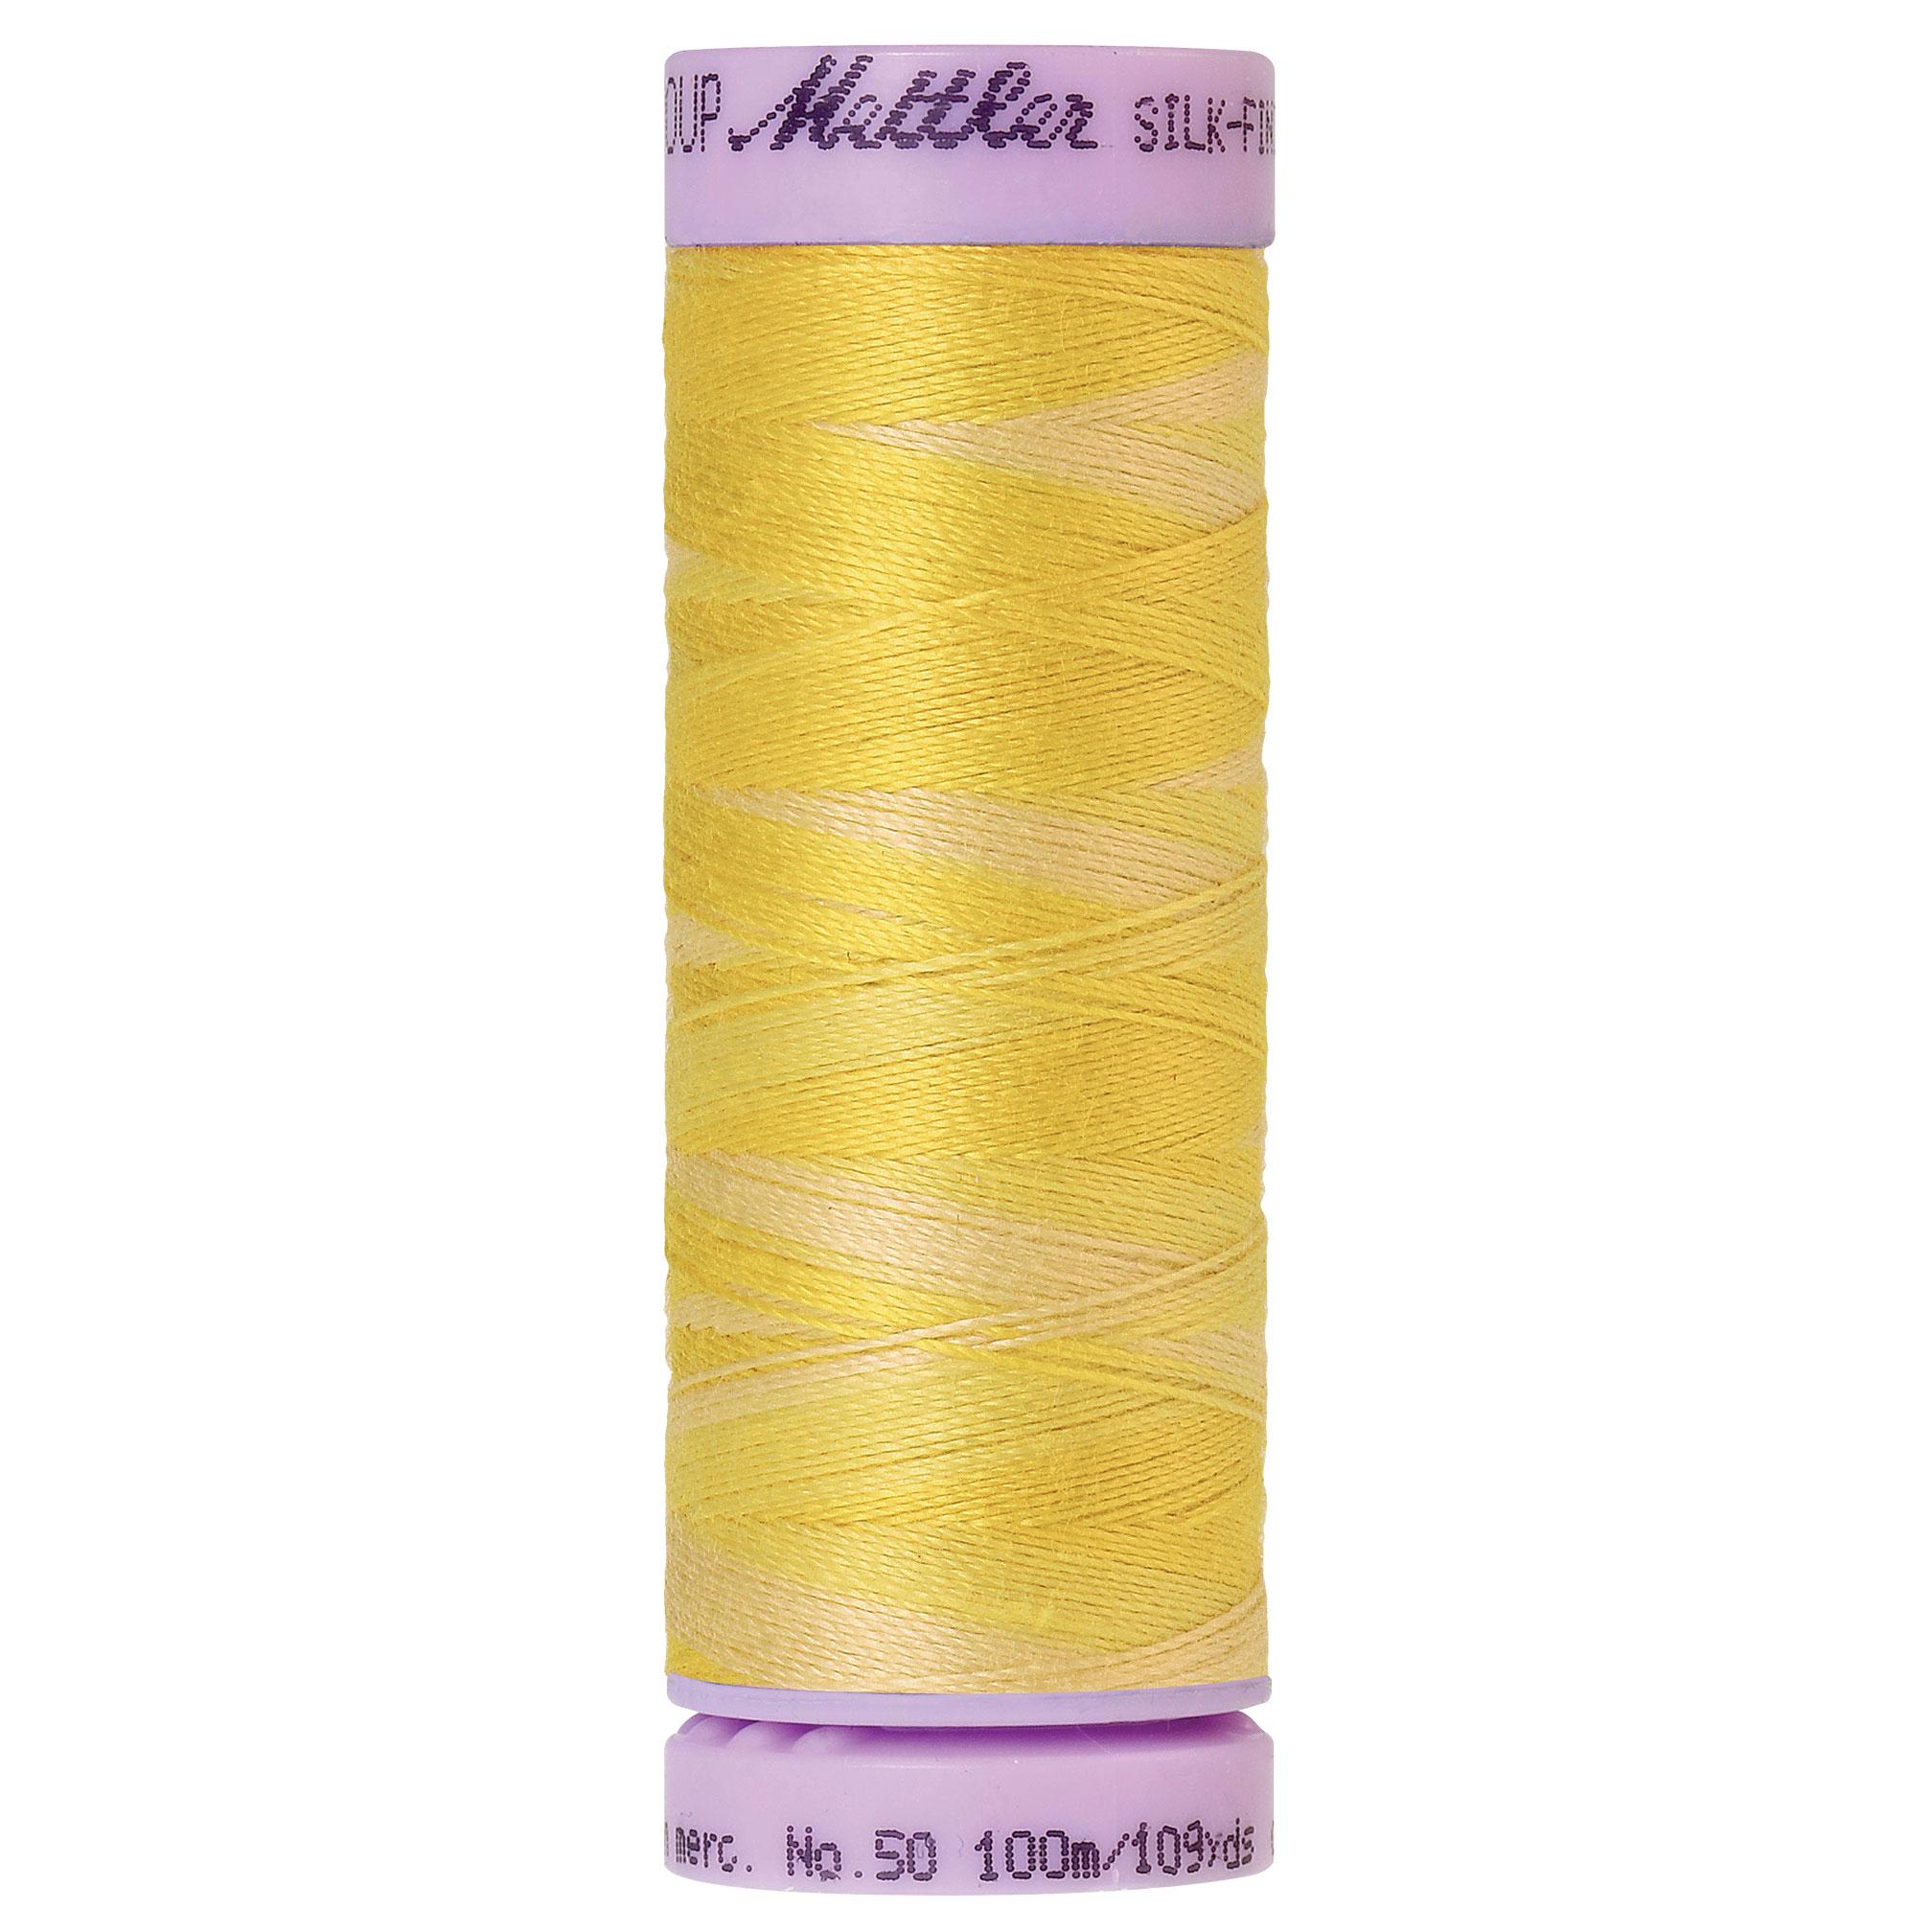 Silk Finish cotton 50 wt 500 yd Canary Yellow